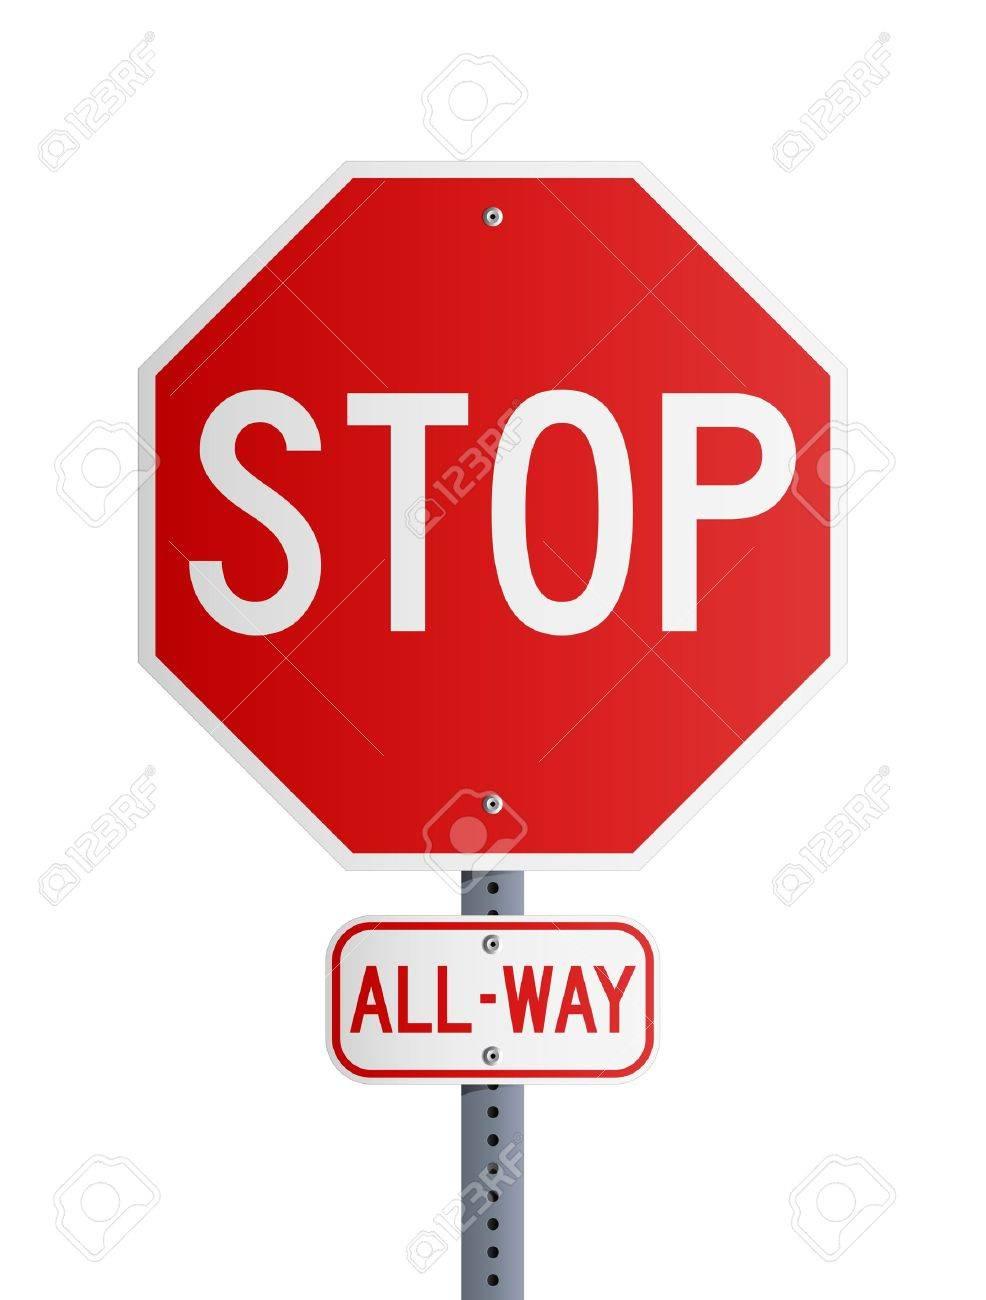 Stop All-Way Stock Vector - 11295301